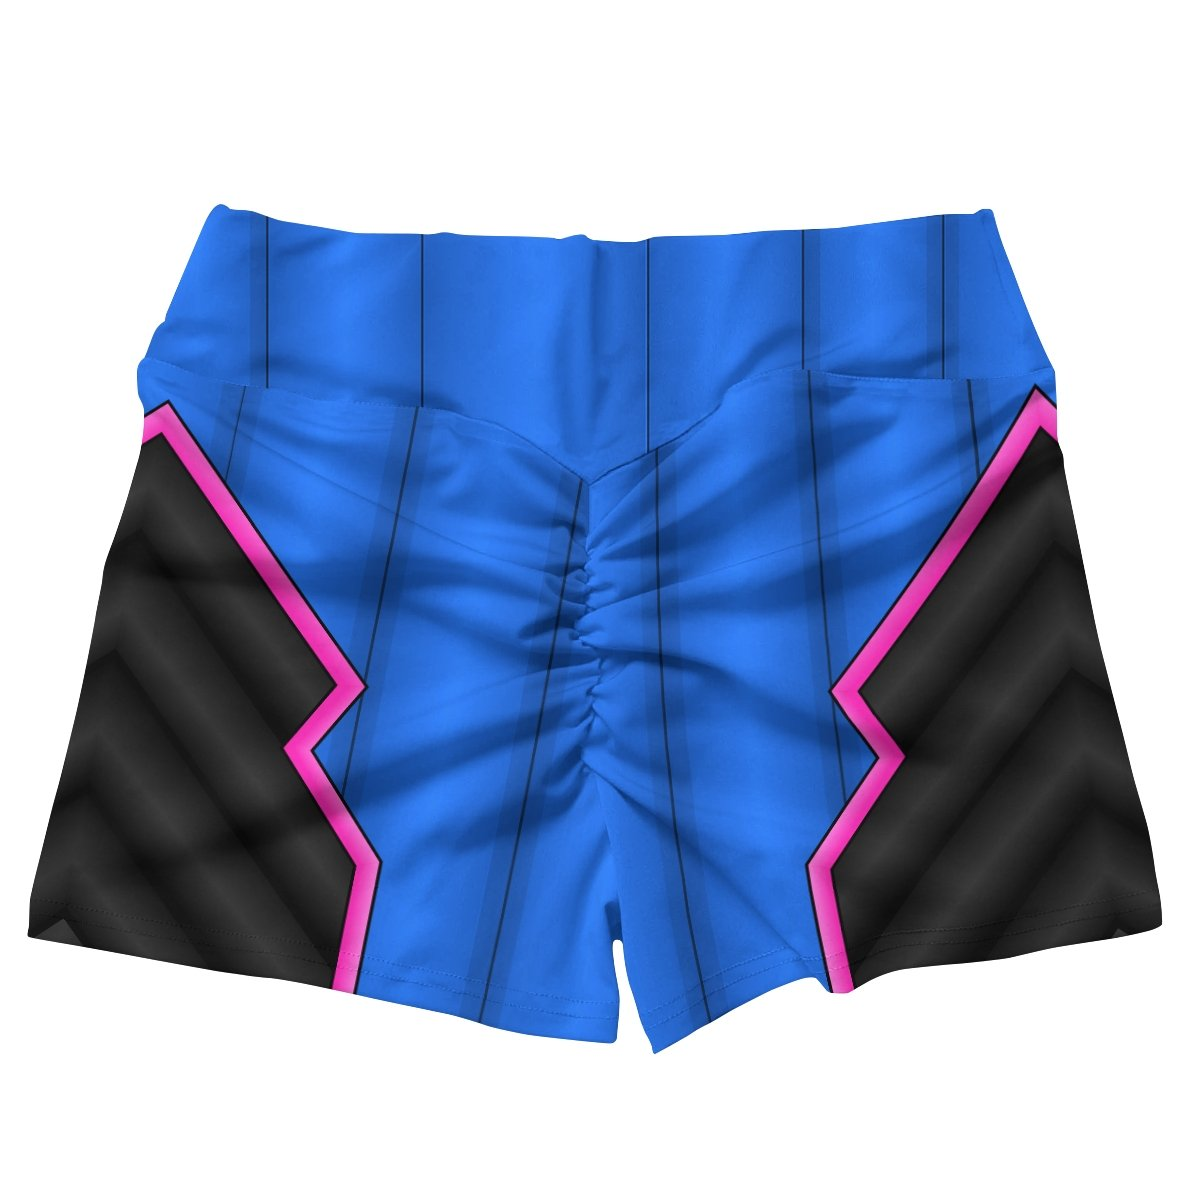 dva summer active wear set 865295 - Anime Swimsuits